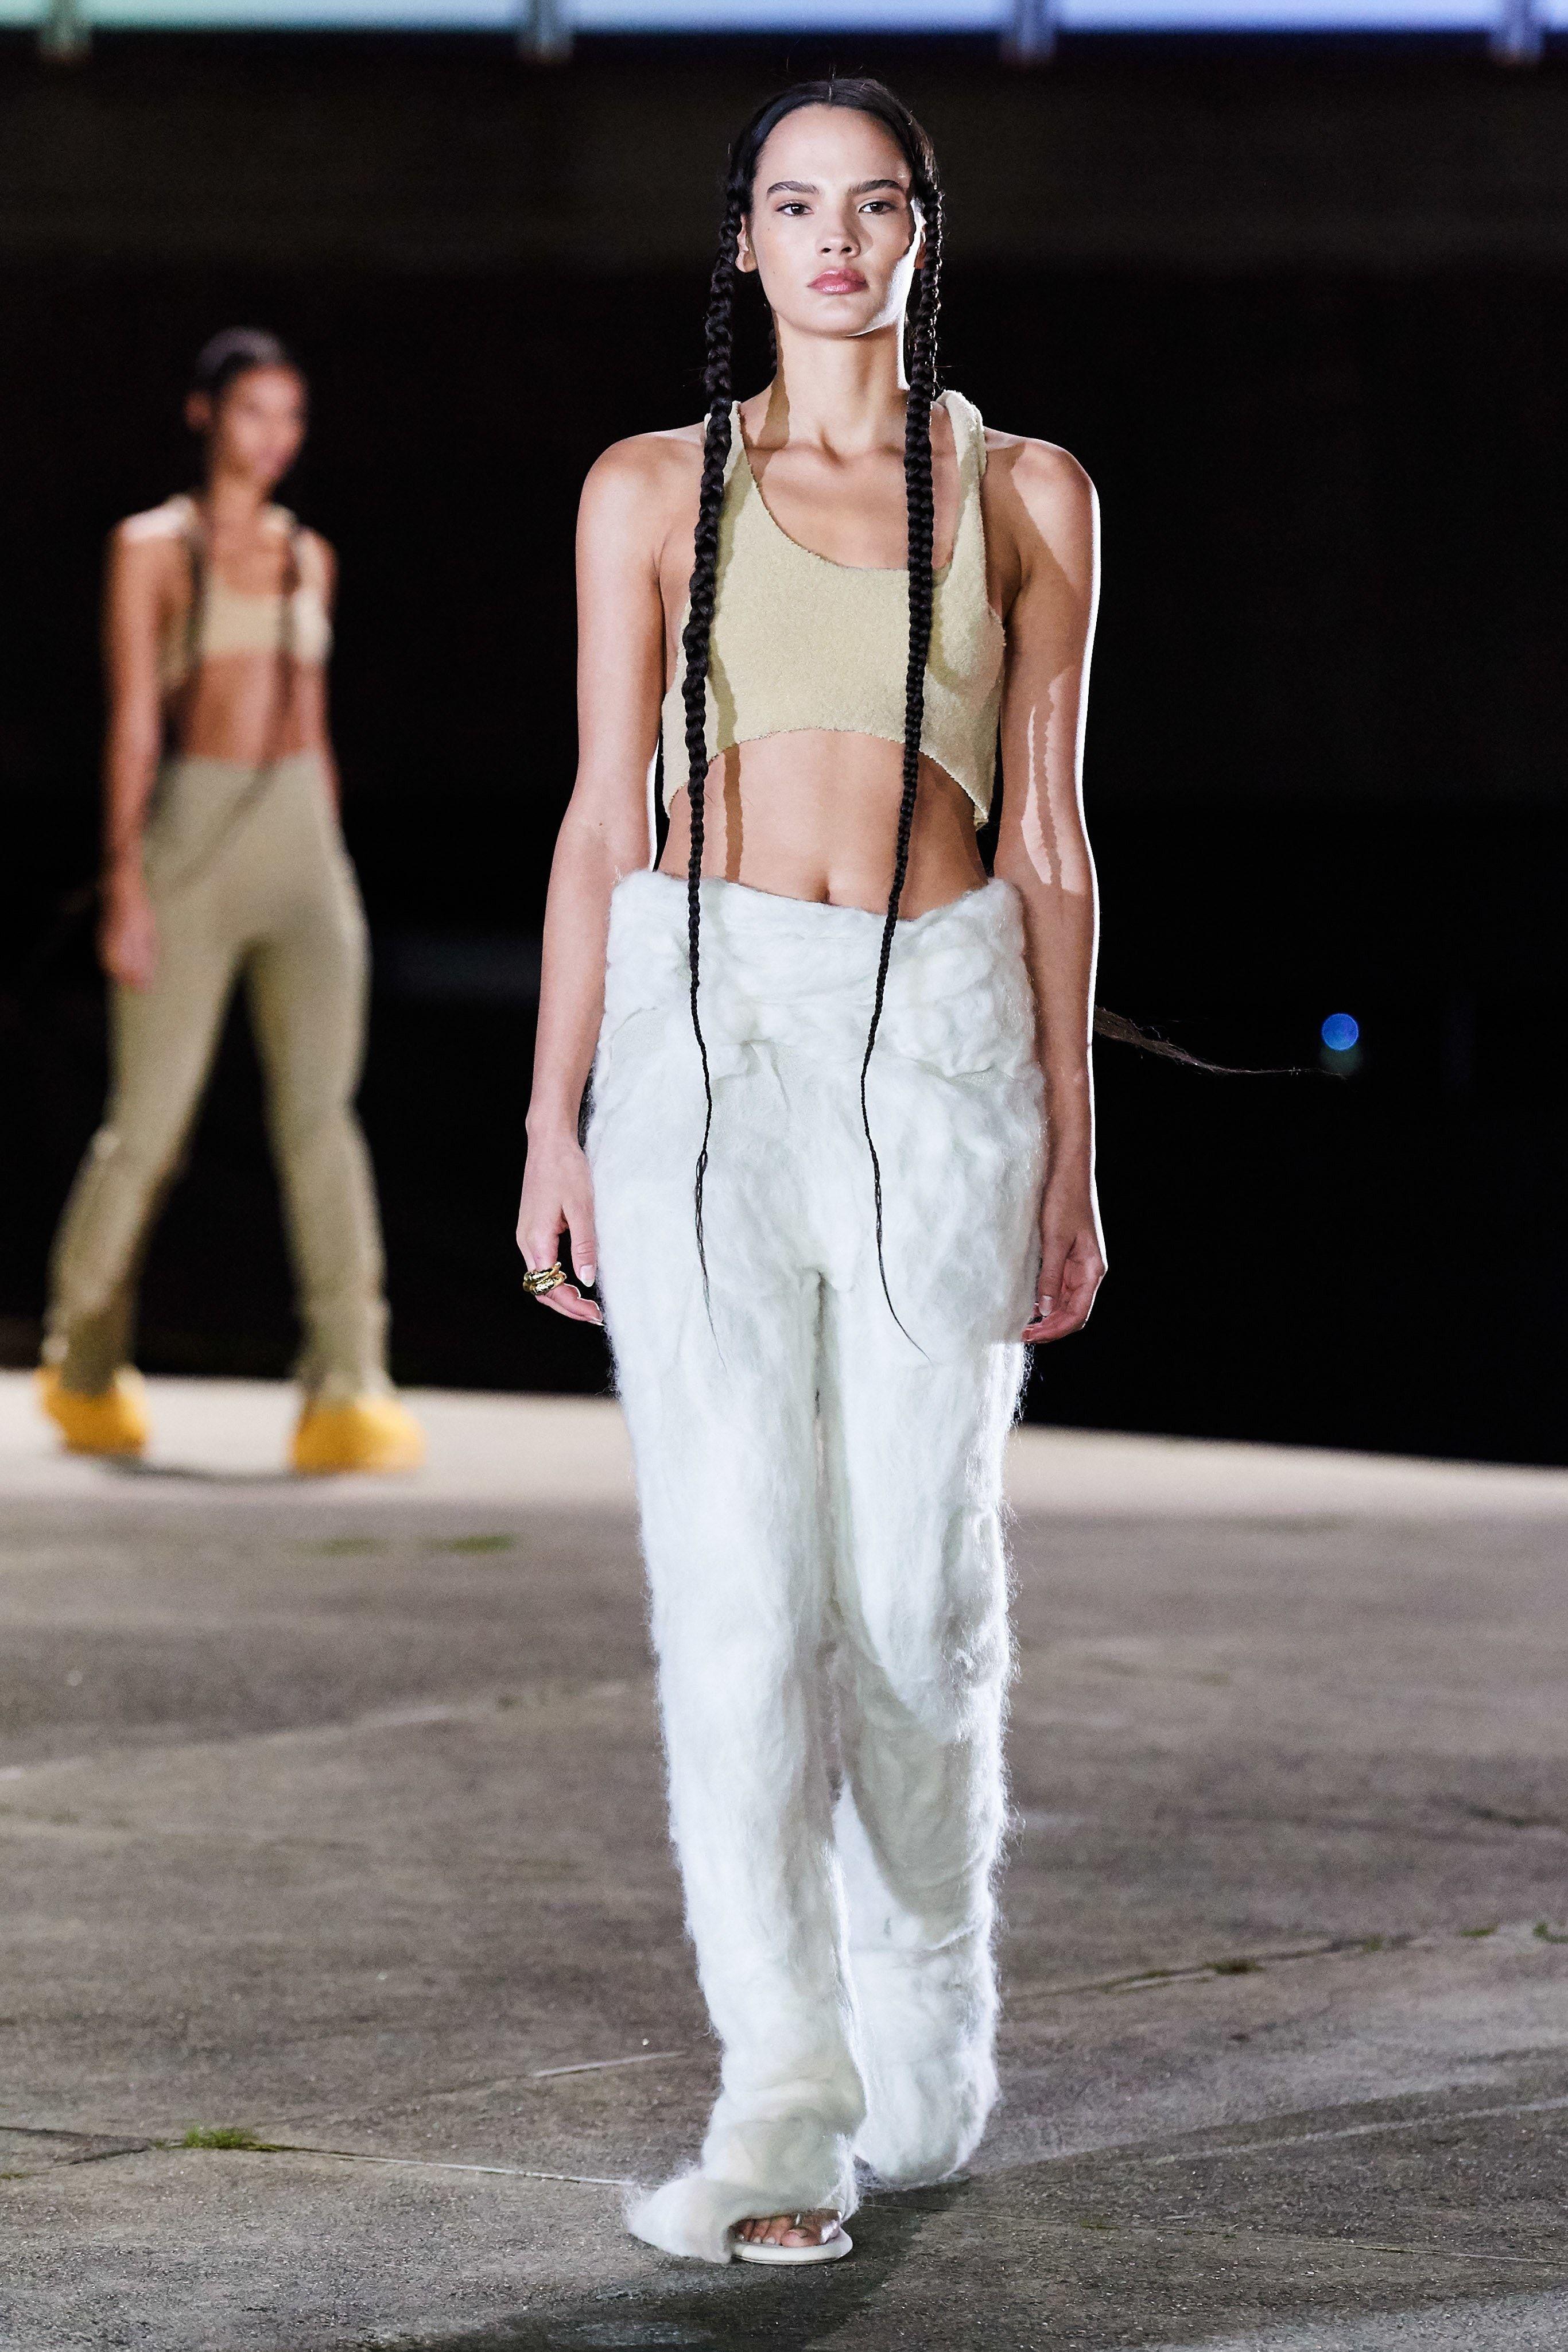 Yeezy Fall 2020 Ready To Wear Fashion Show In 2020 Fashion Fashion Week Crowd Yeezy By Kanye West